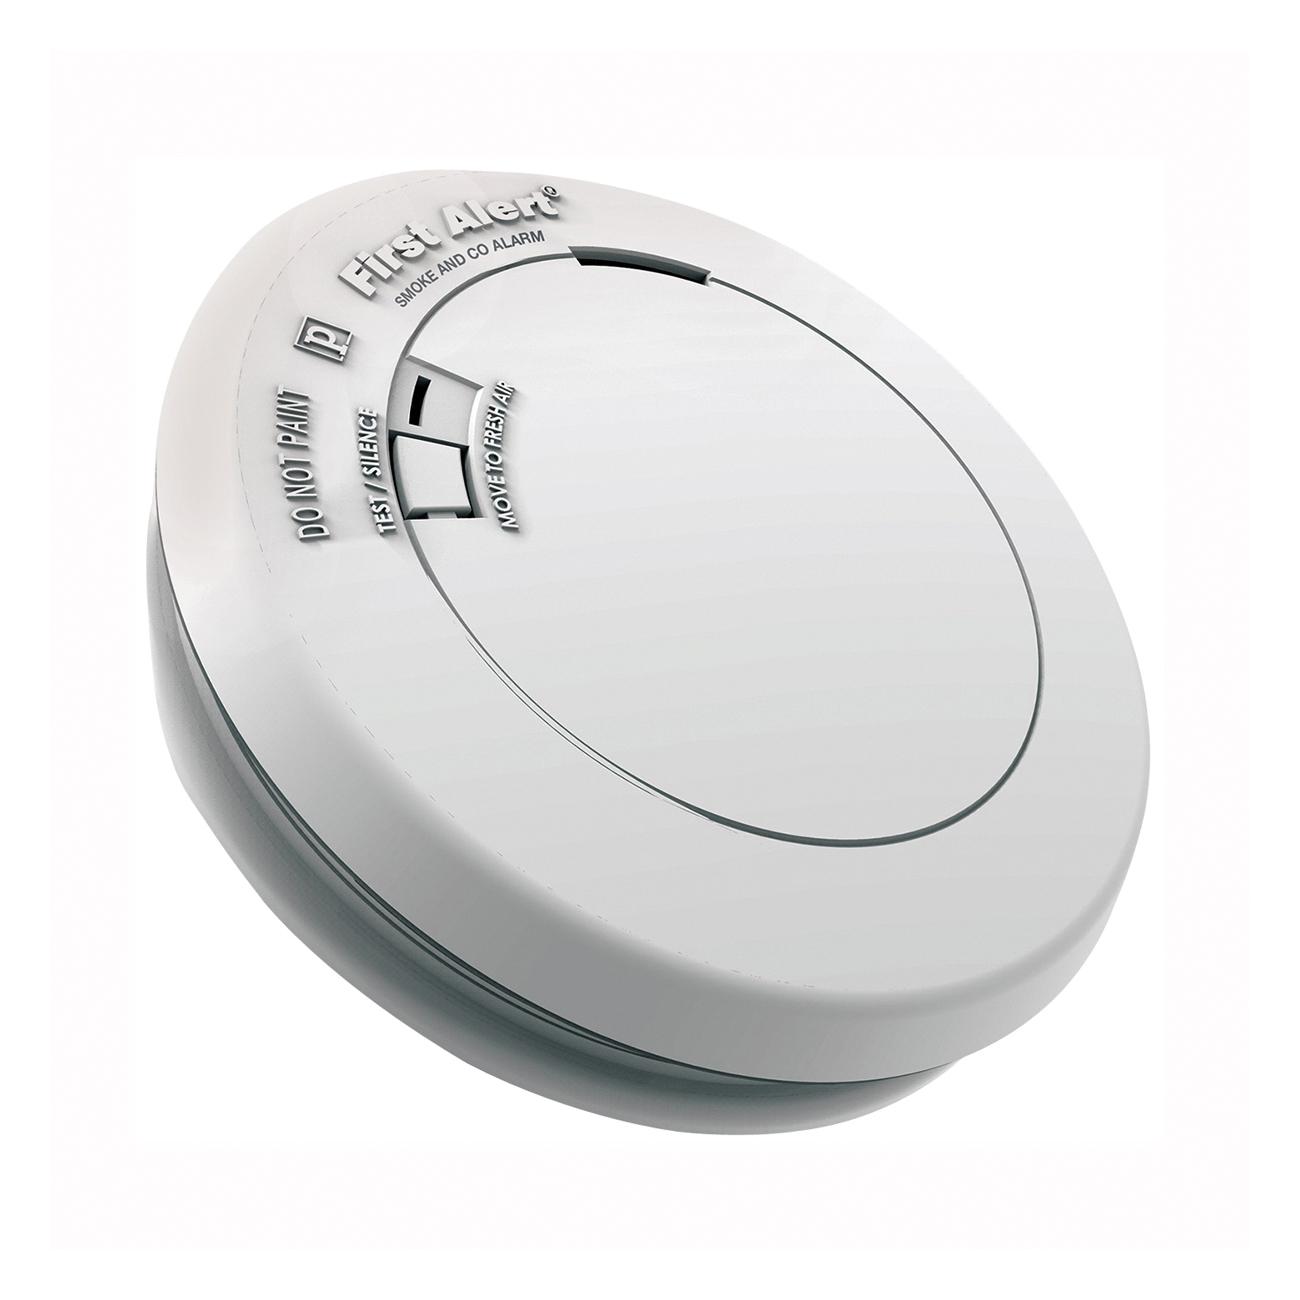 Picture of FIRST ALERT PRC710 Carbon Monoxide Alarm, 85 dB, Alarm: Audible, Electrochemical, Photoelectric Sensor, White